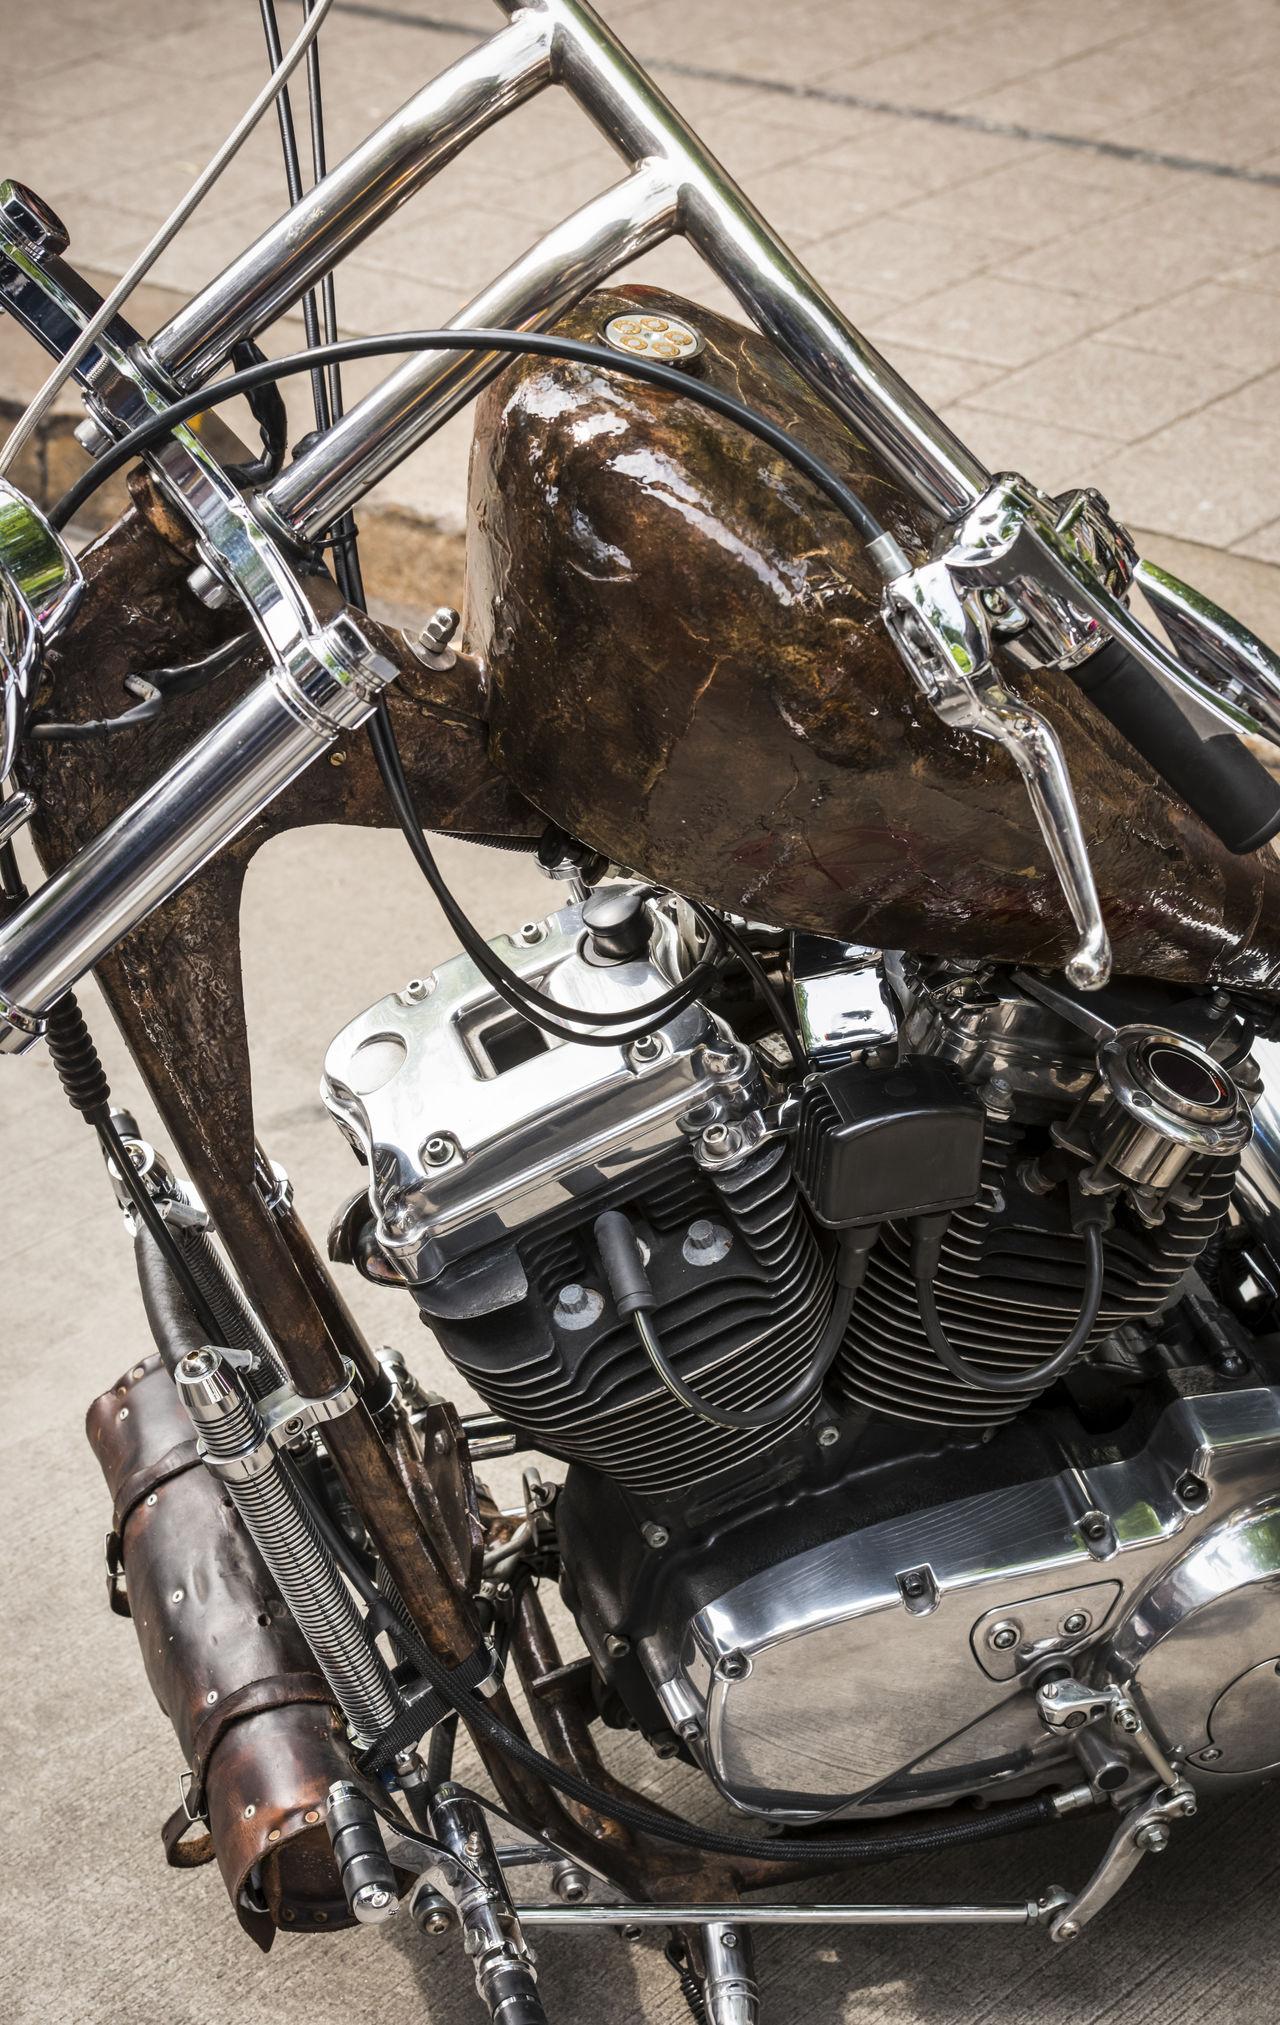 HDR Motorcycle Details Bike Biker Chrome Details Hamburg HDR Motorcycle Motorcycle Riders Power Reeperbahn  Speed